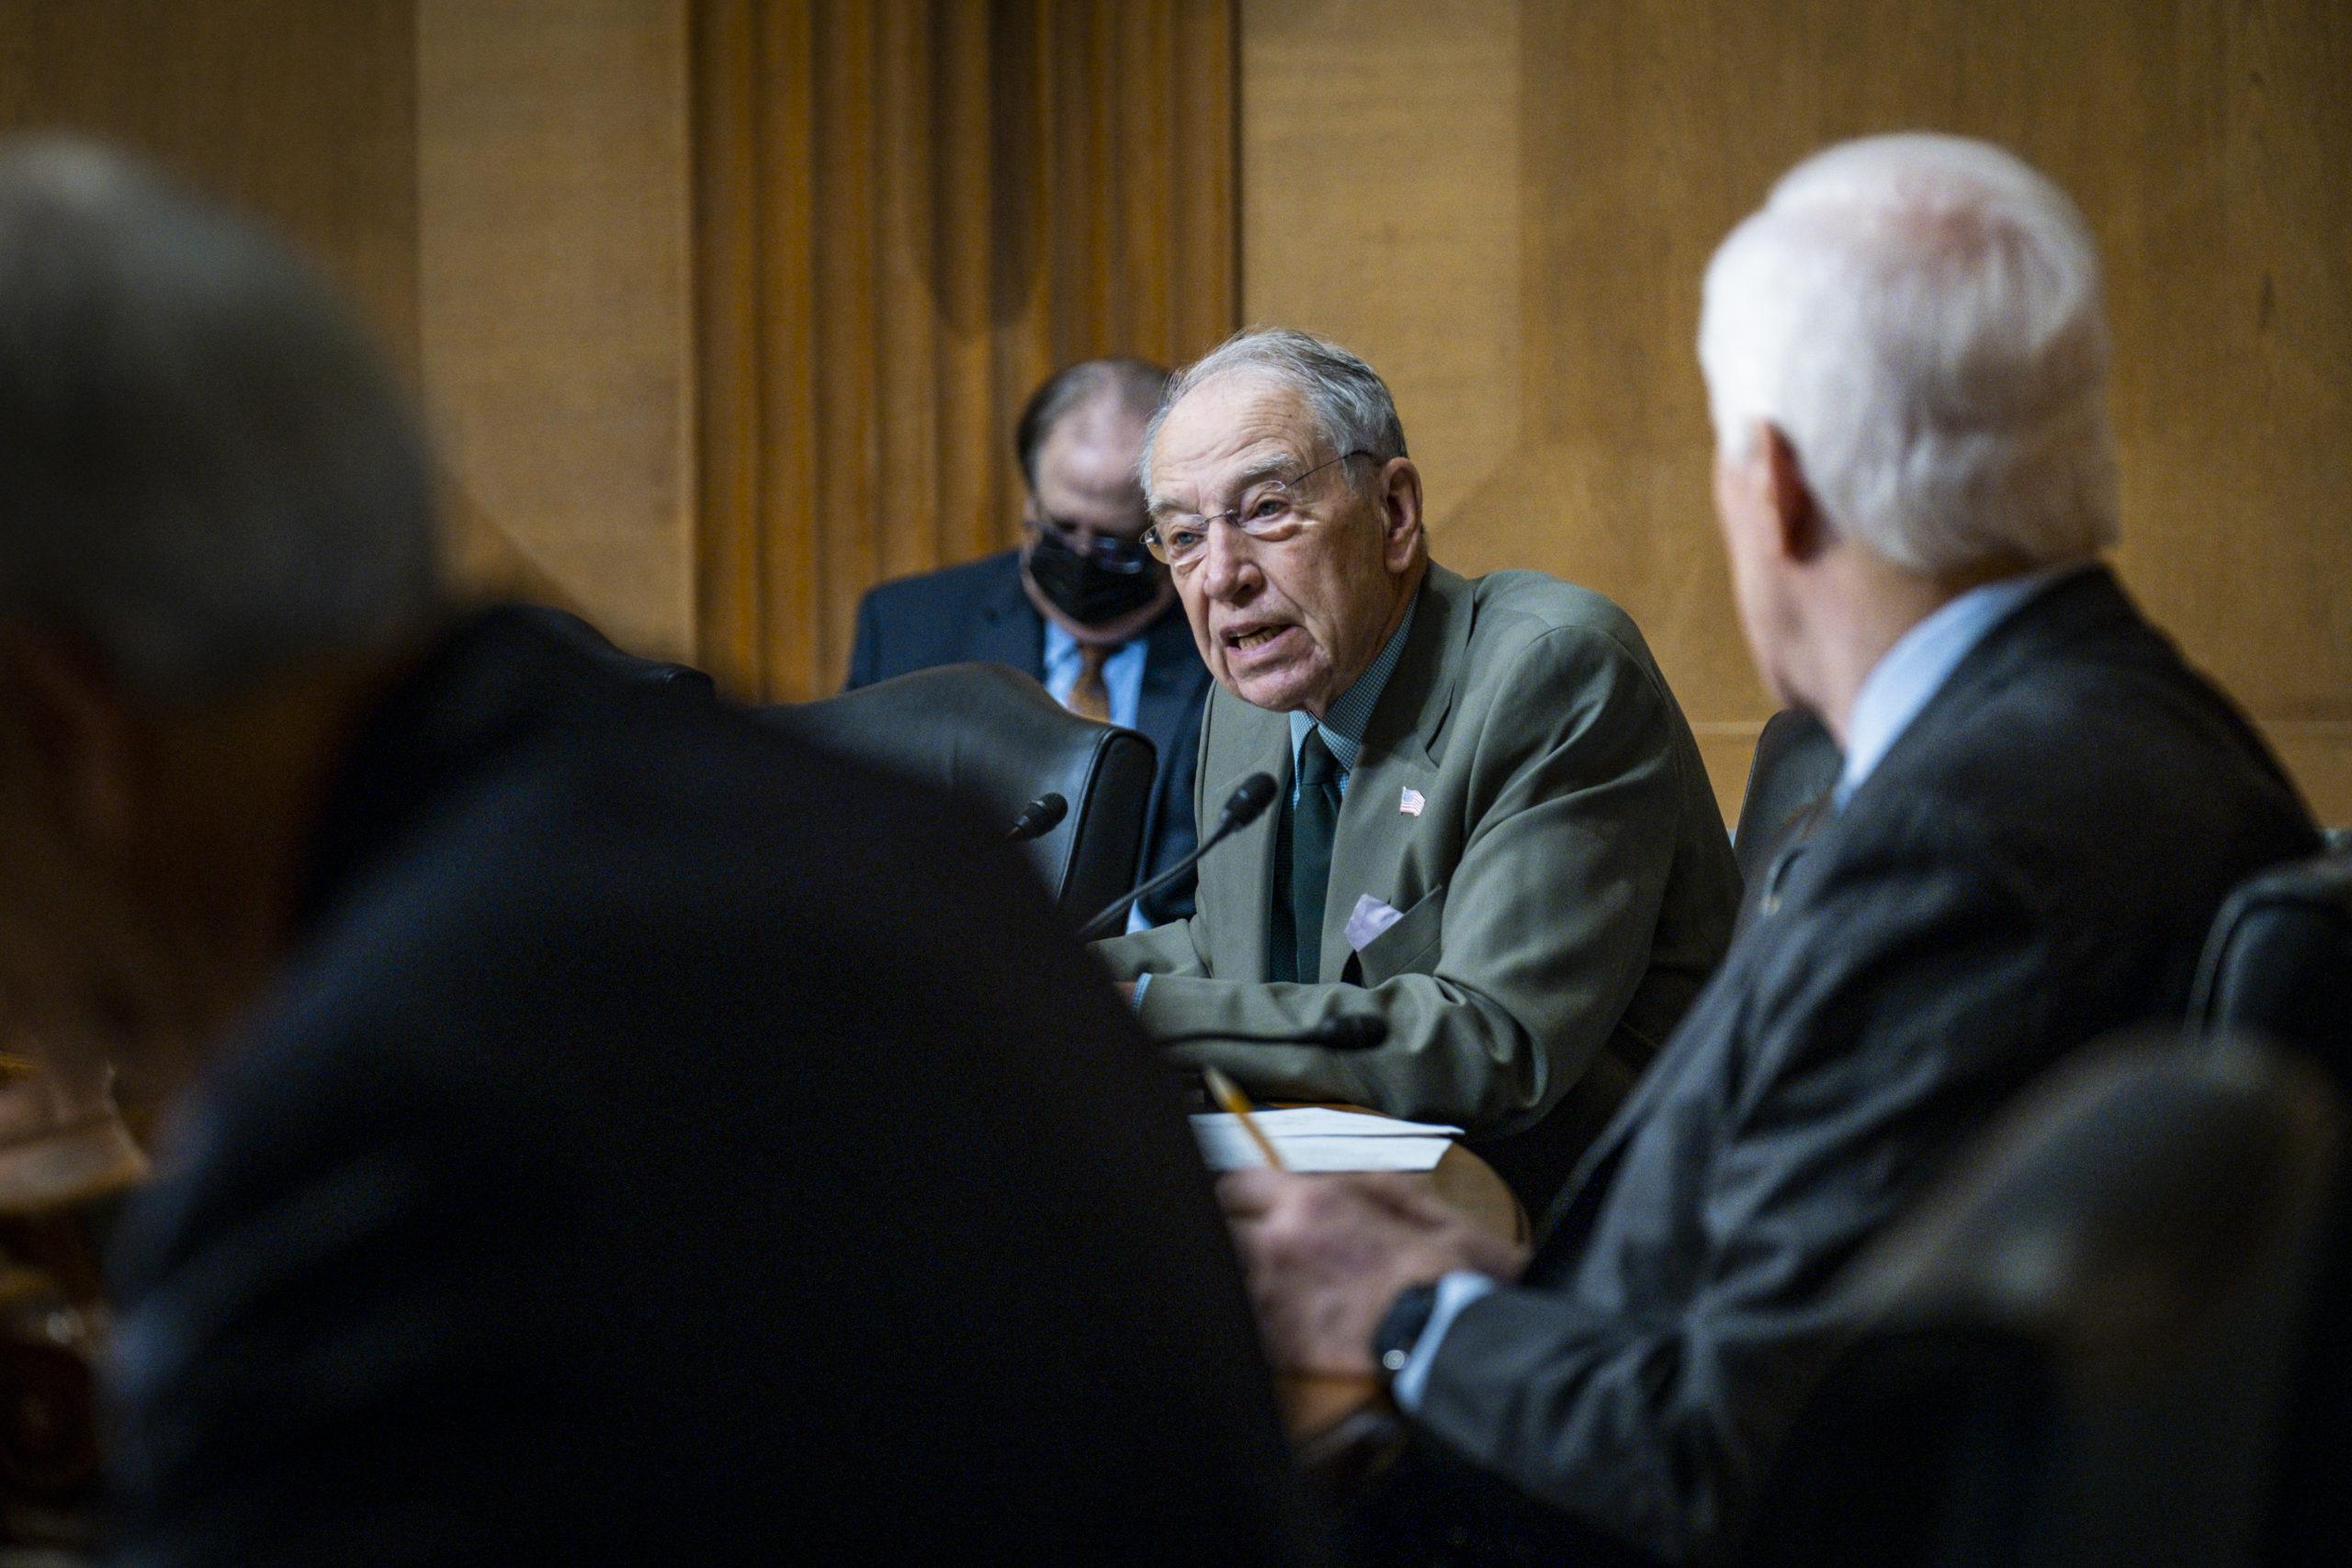 U.S. Trade Rep. Tai Testifies On Trade Agenda Before Senate Finance Committee